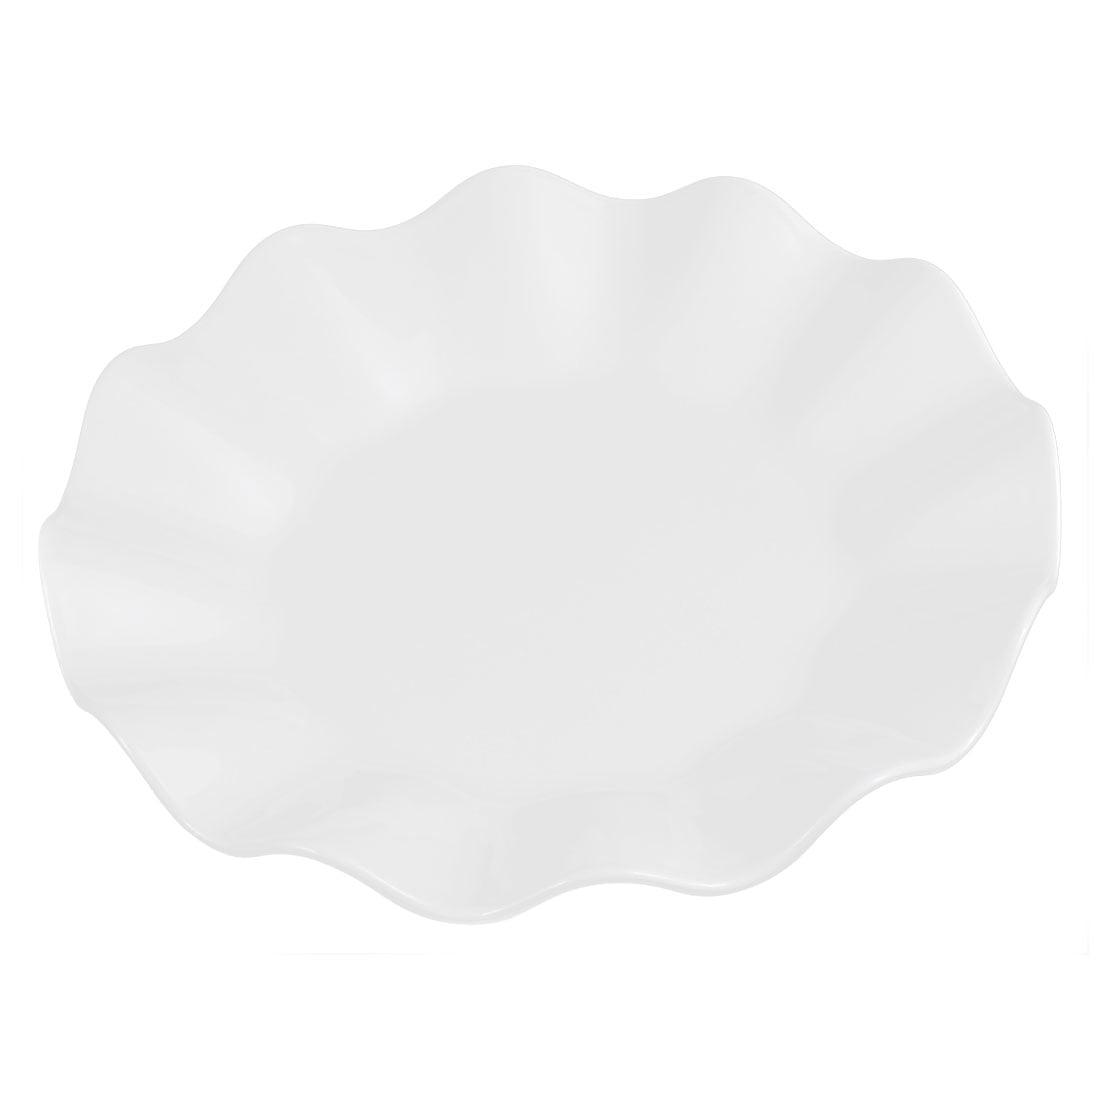 Restaurant Wavy Edge Pastry Appetizer Dessert Dish Plate White 16cm Dia by